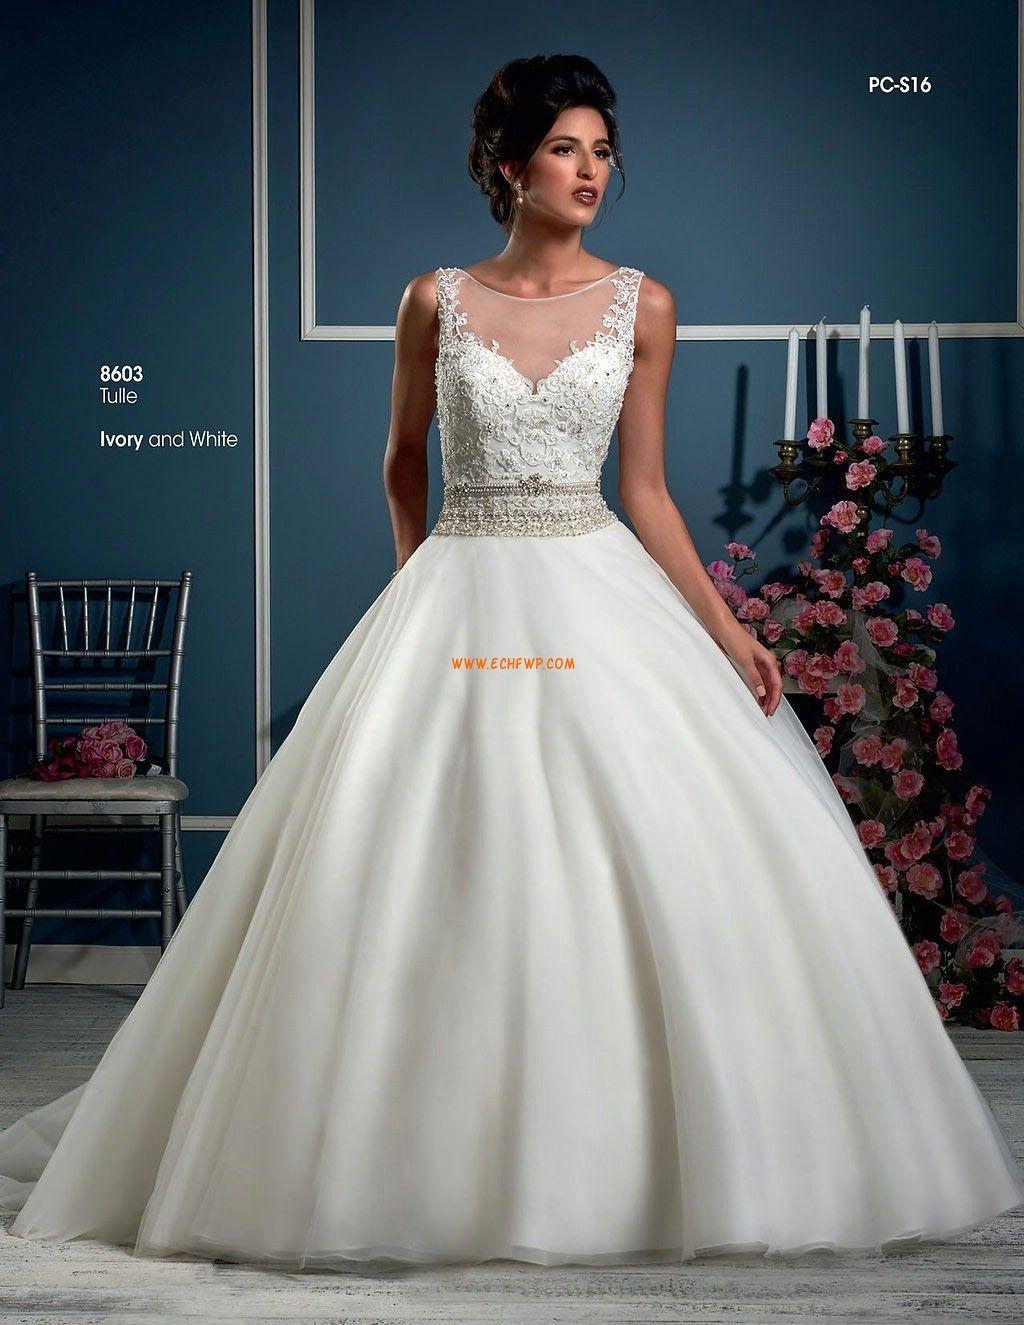 Bonny Essence Wedding Dresses - Style 8603 | Brautkleider ...